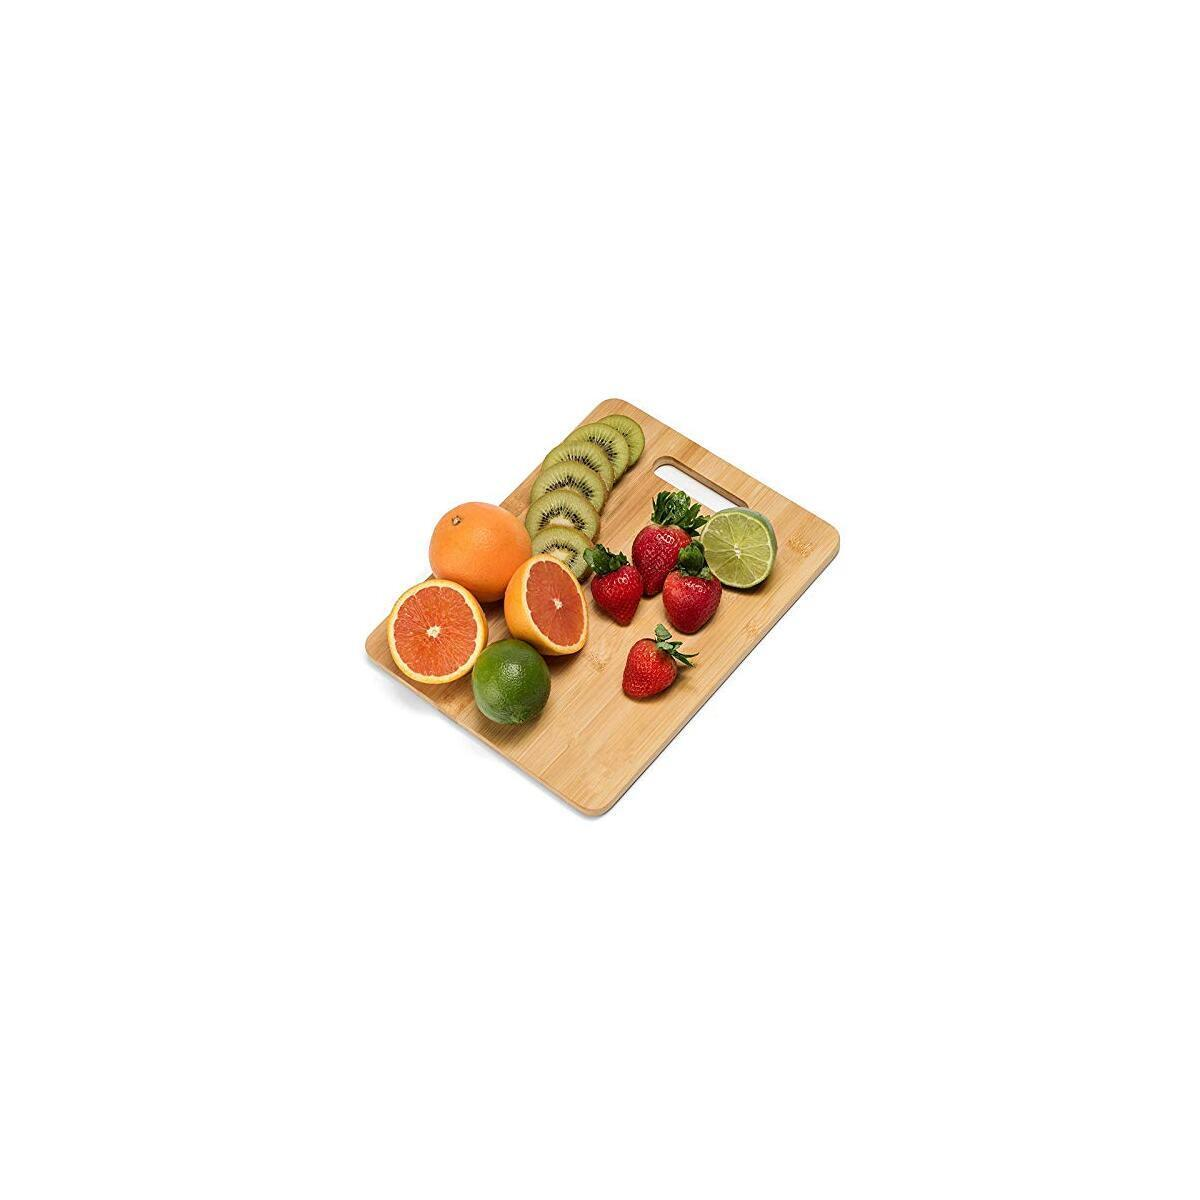 Cutting Board Organic Premium Cutting Board- 3 Pack - Large Cutting Board - Cutting Board Board Cutting Board